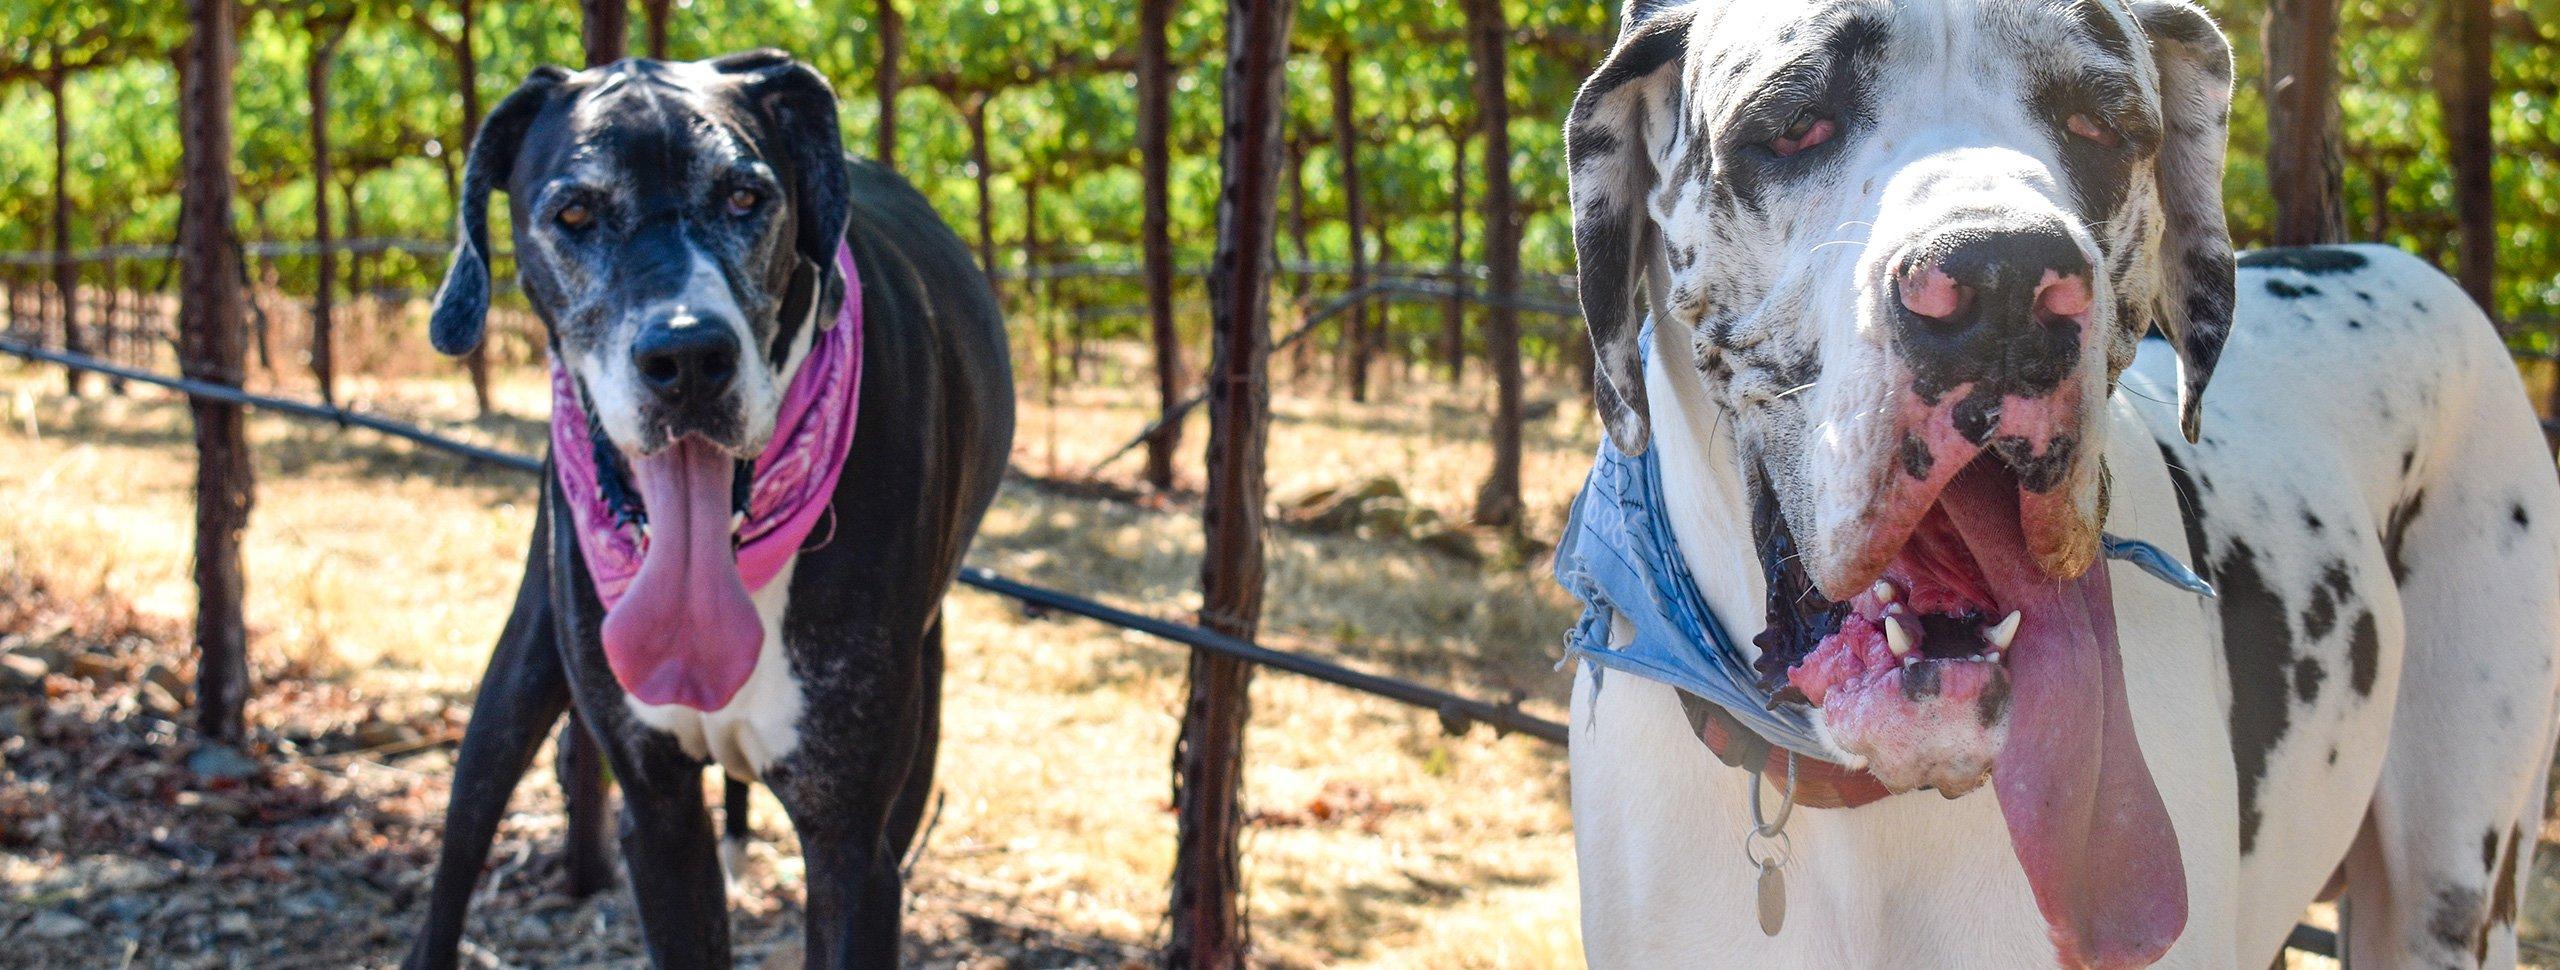 Dogs in Vineyard